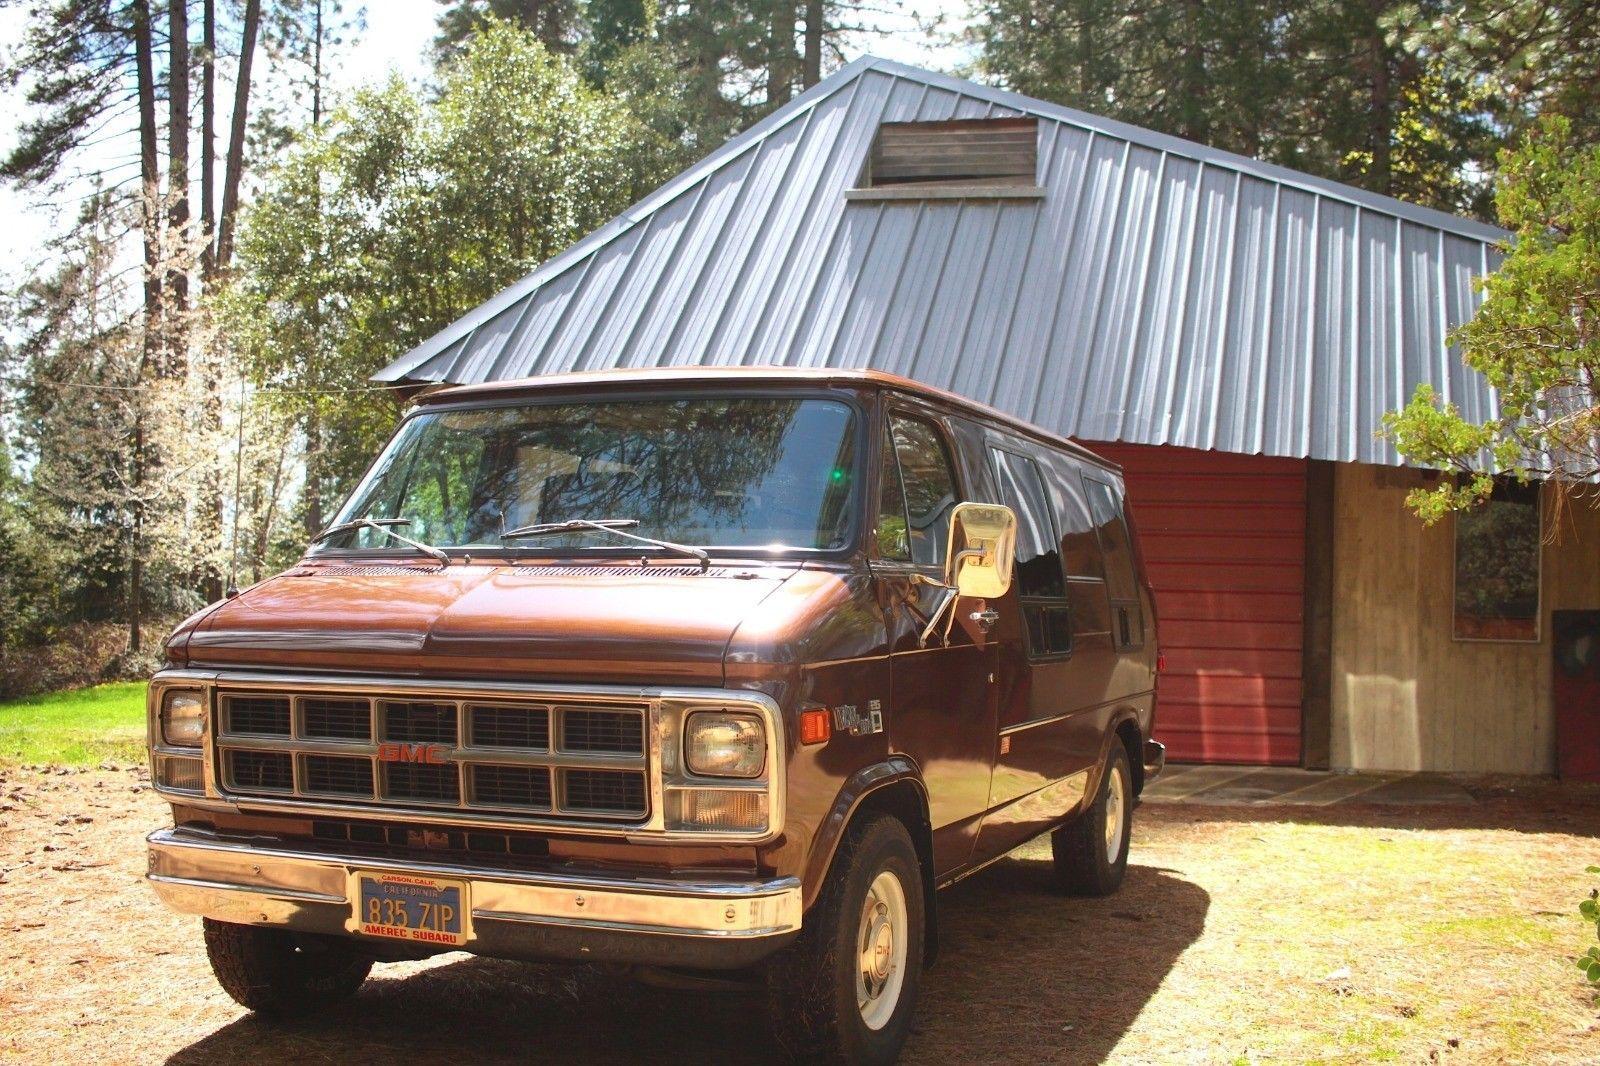 Vintage 1979 Gmc Vans Google Search Gmc Vans Gmc Vintage Camper